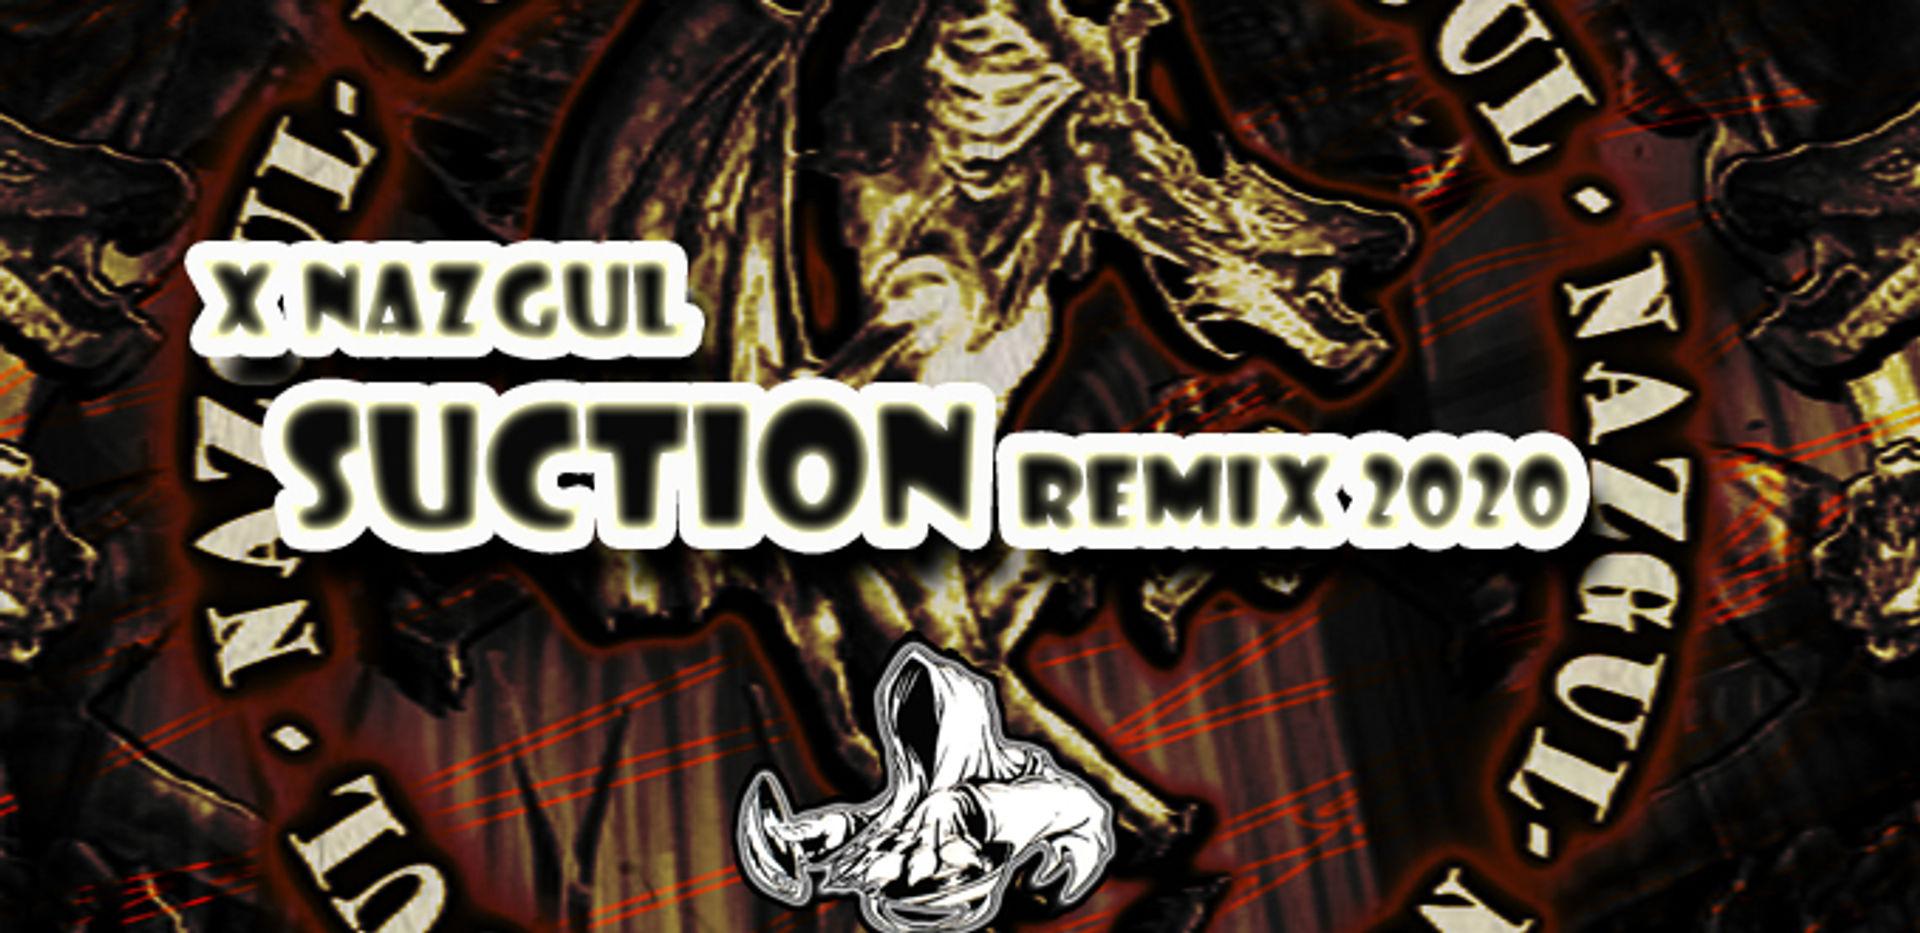 XNazgul - Suction (Remix 2020)